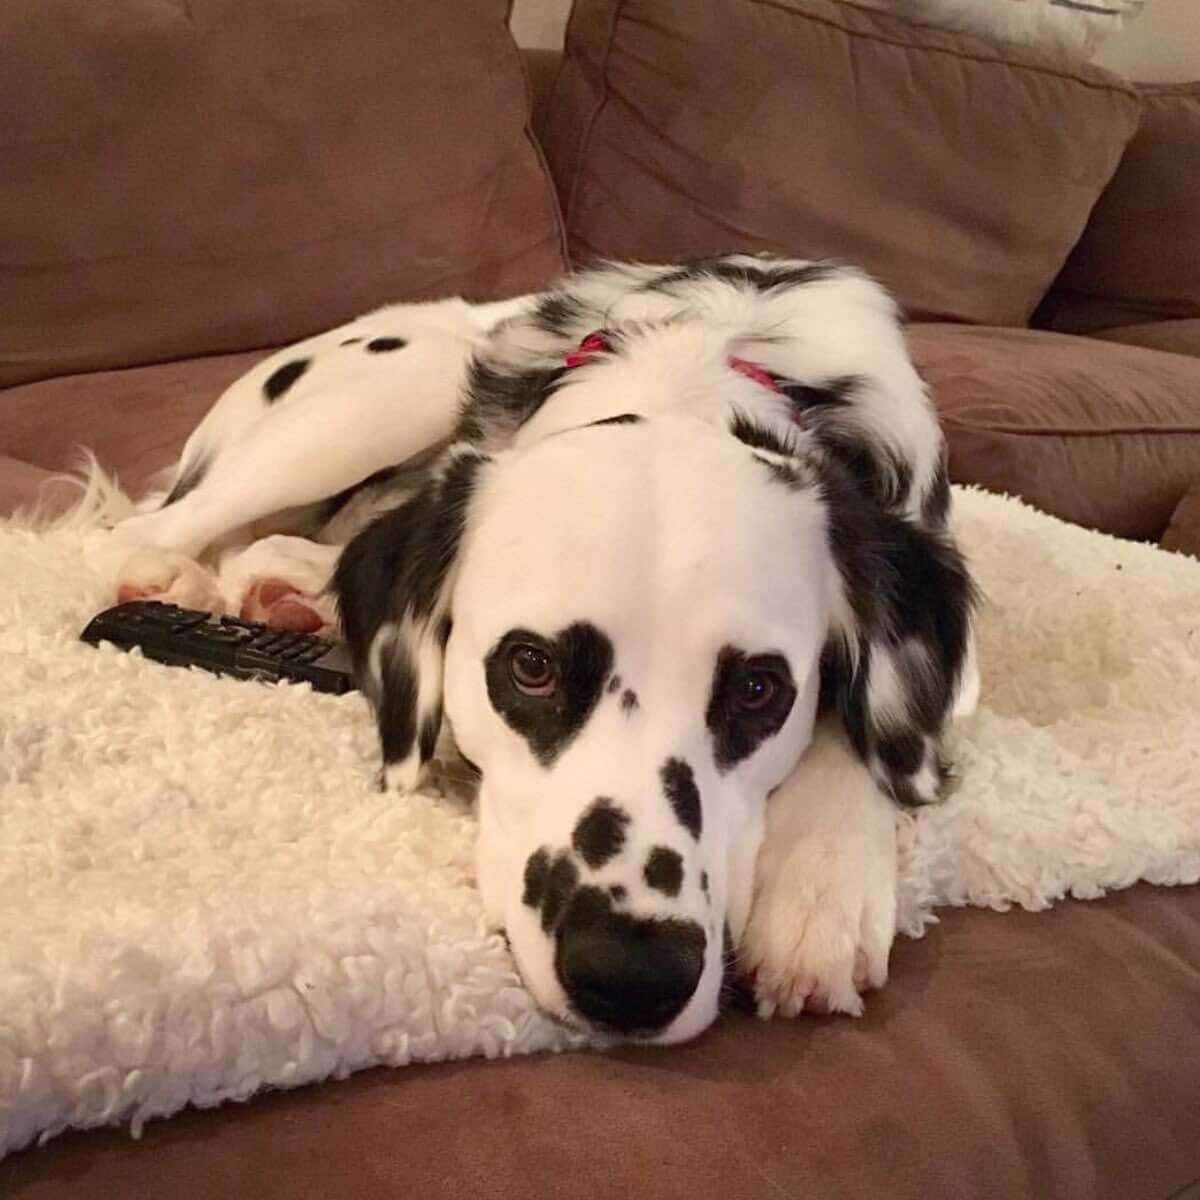 charlie the dalmatian heart shaped eyes 2 (1)